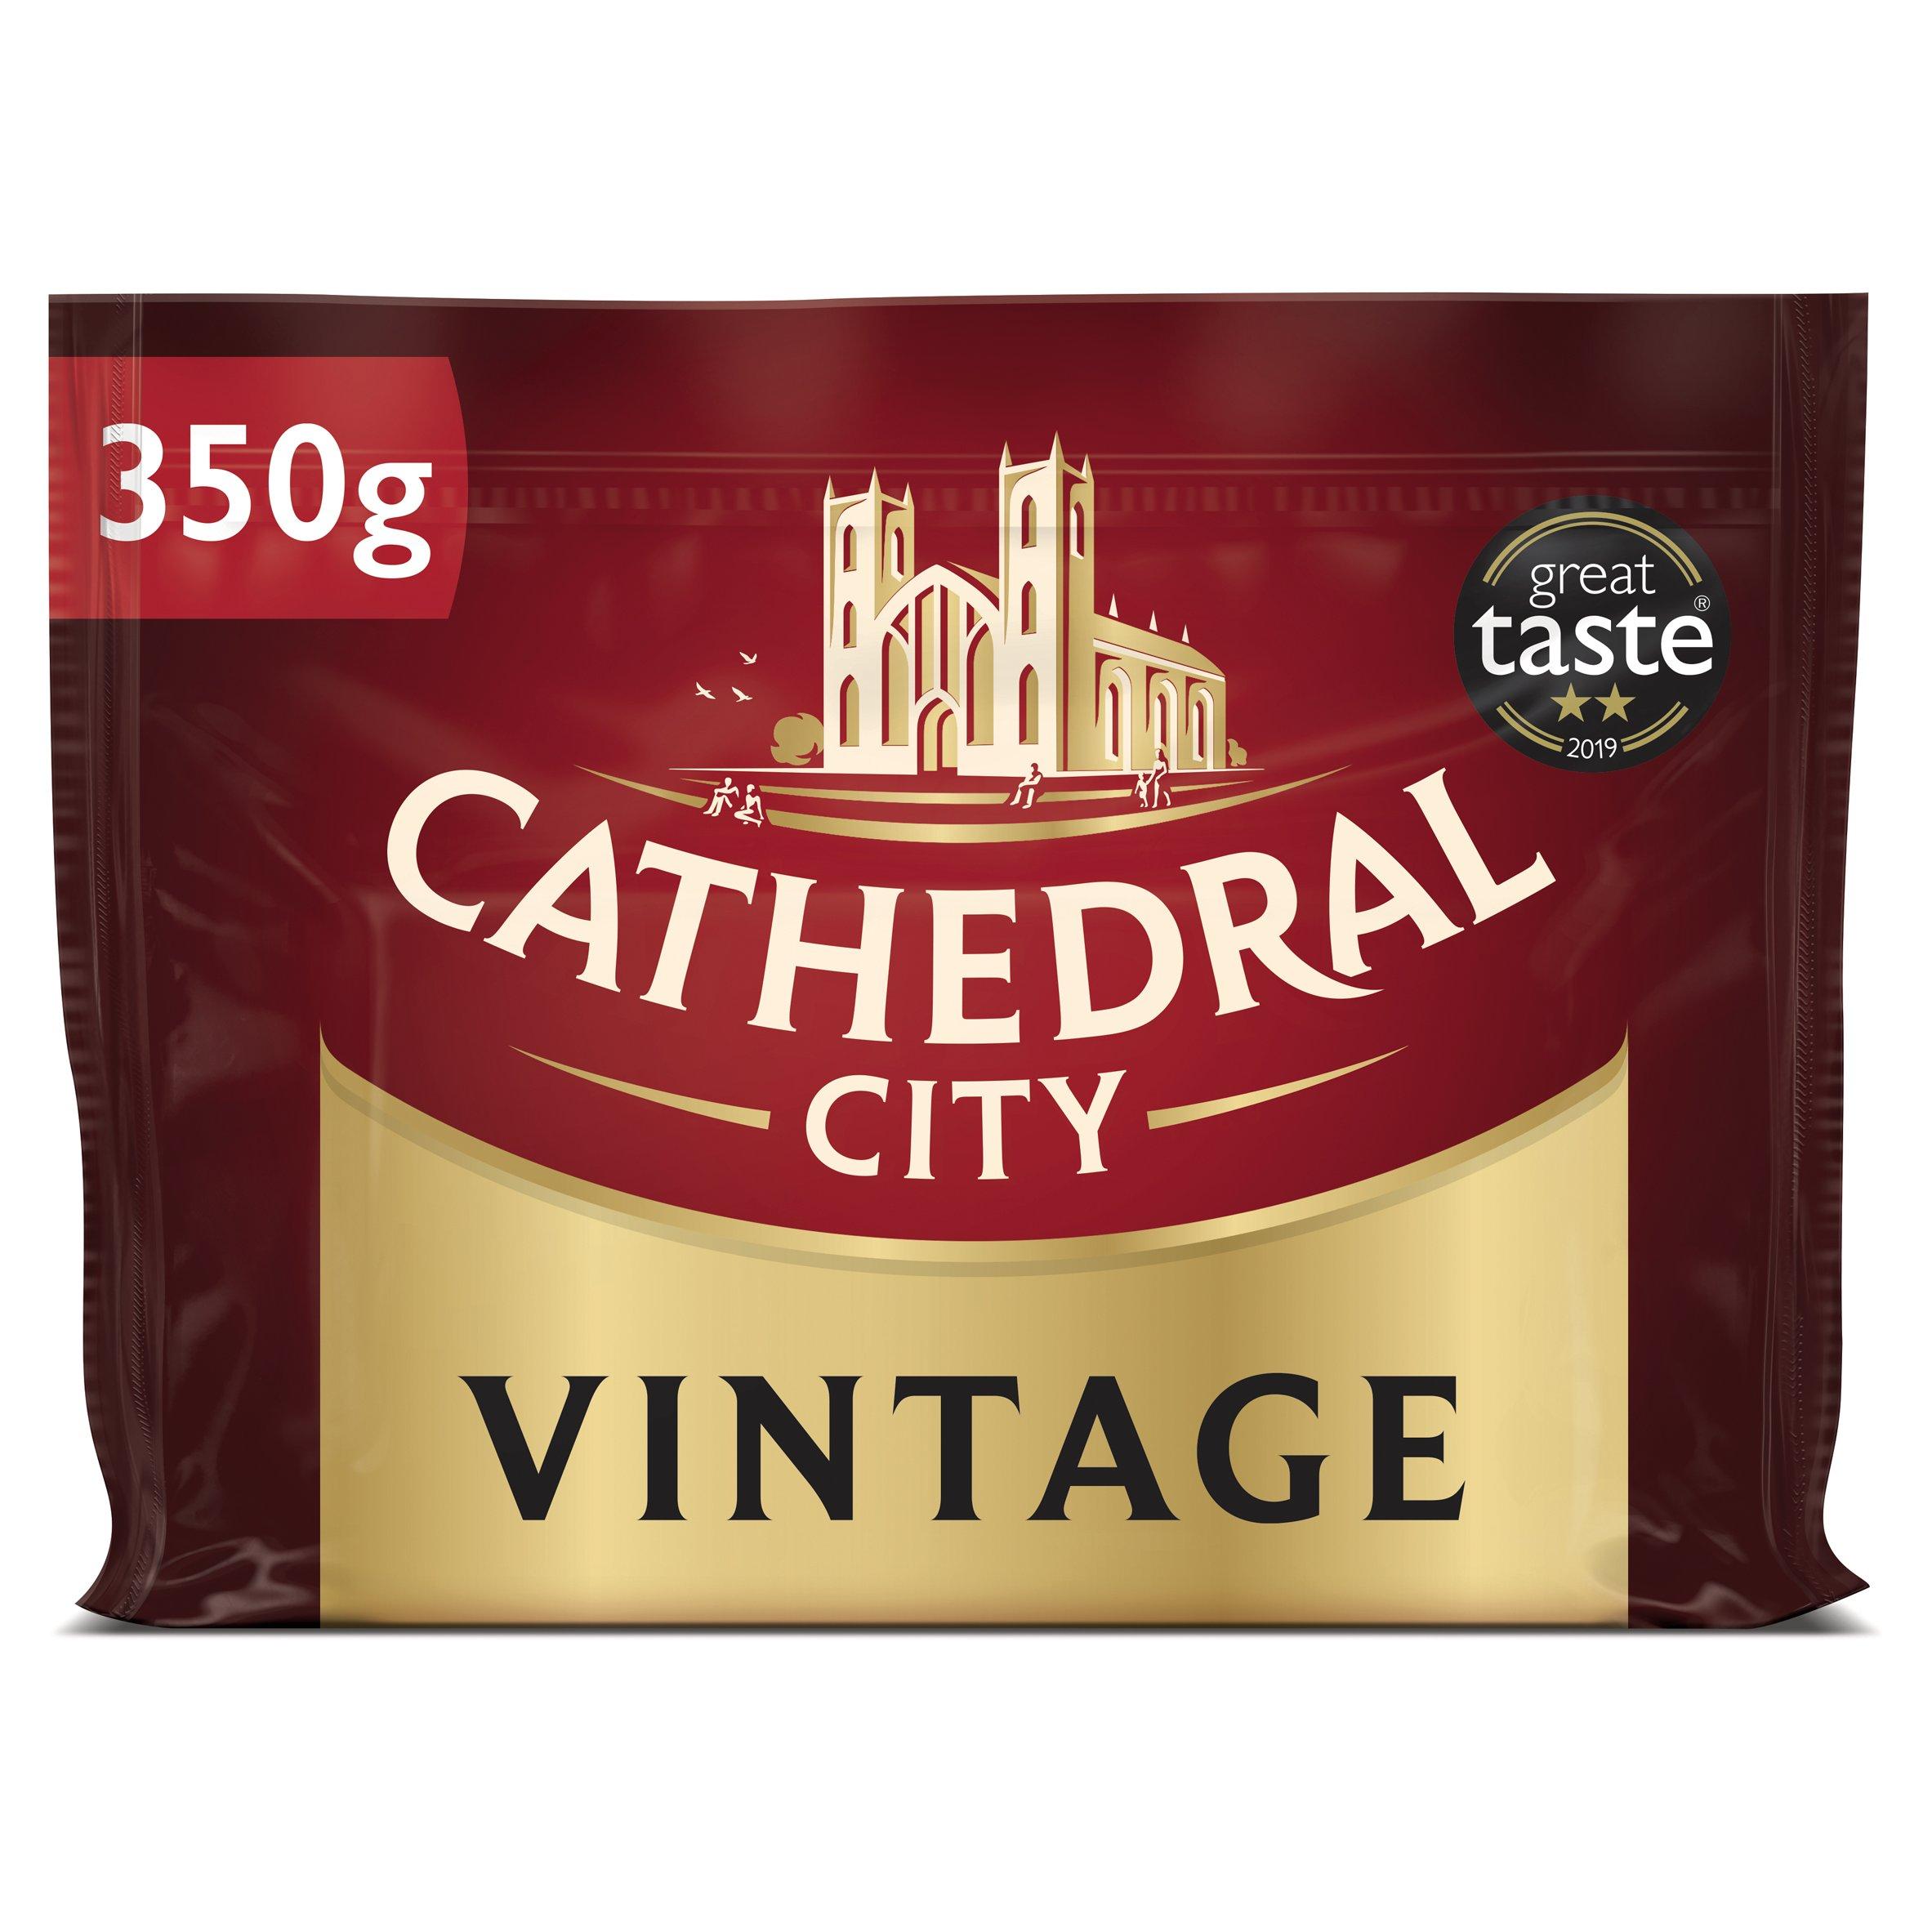 Cathedral City Vintage Cheddar 350G